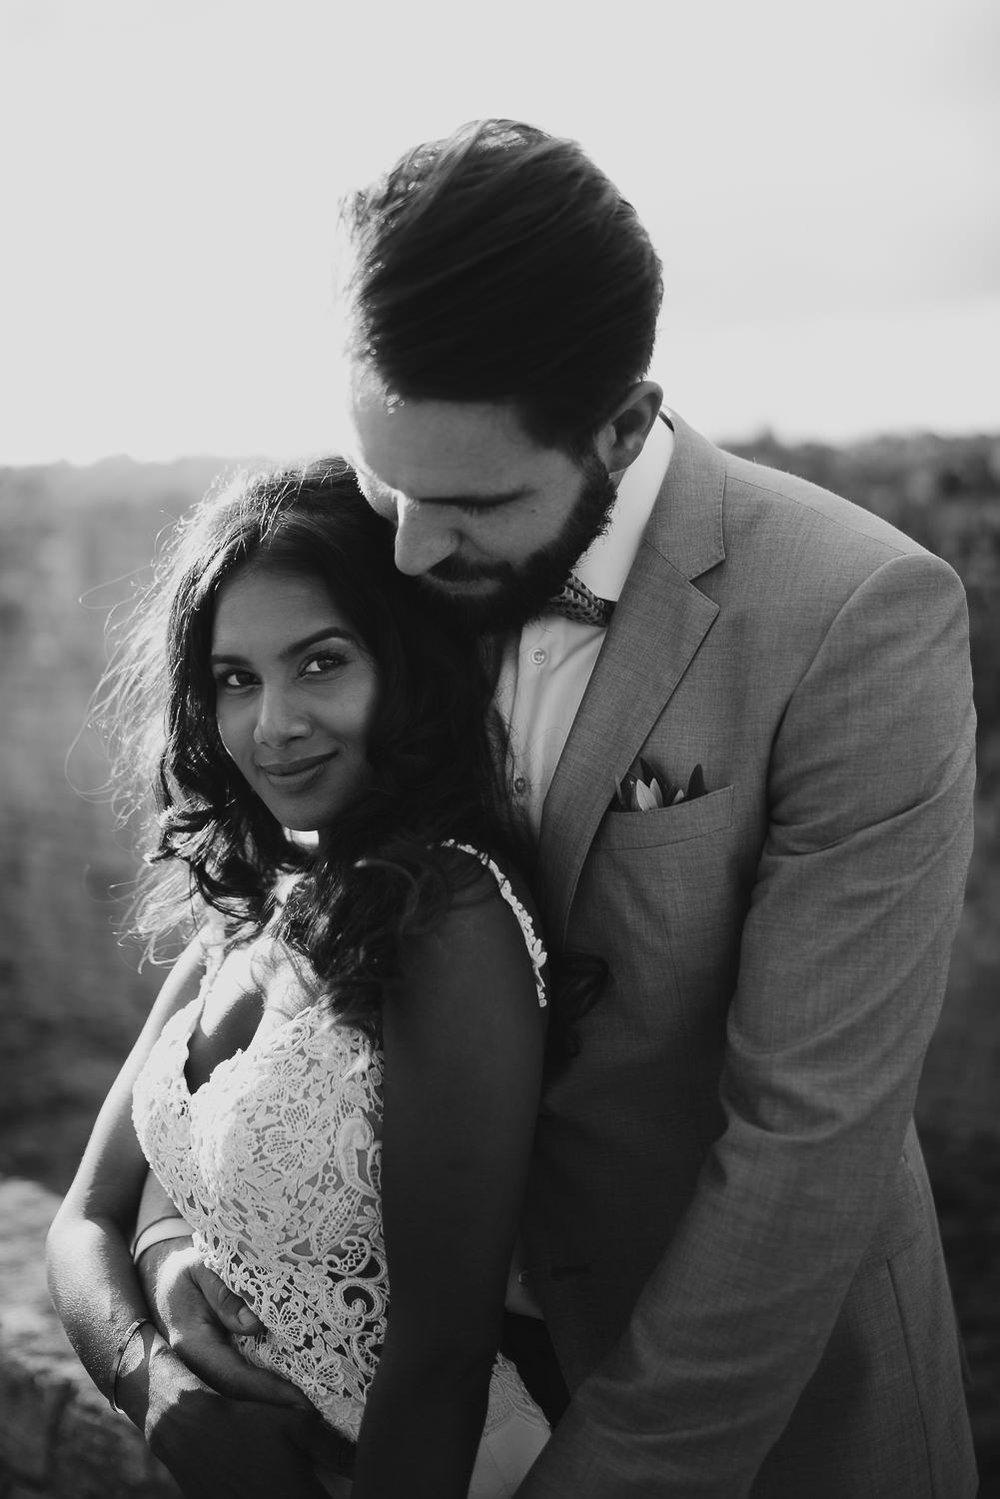 best romantic wedding photography in amsterdam by mark hadden - couple shoot portrait